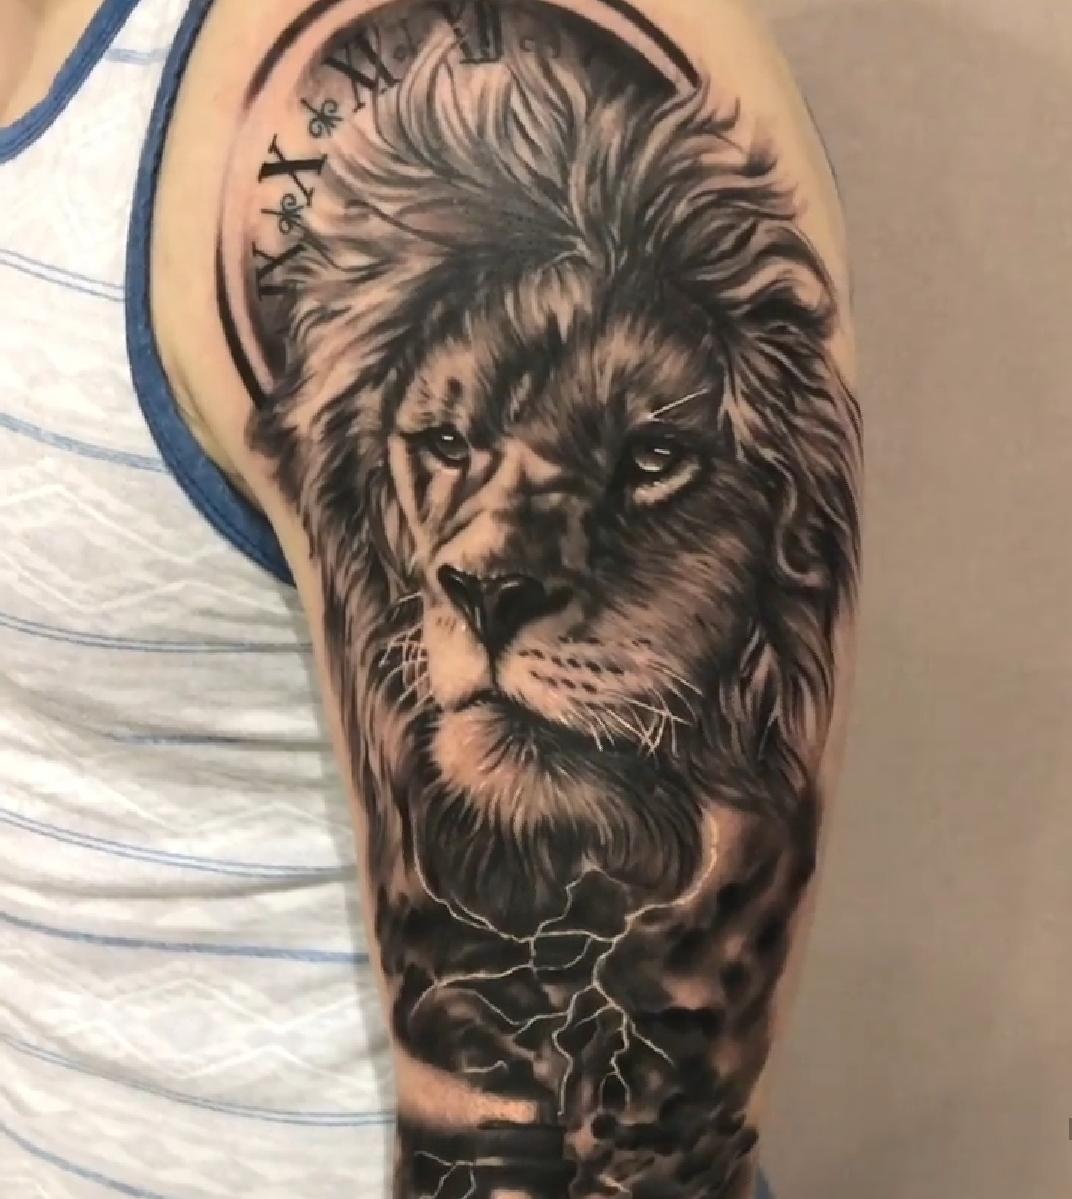 Lion Arm Tattoo by Alec Turner